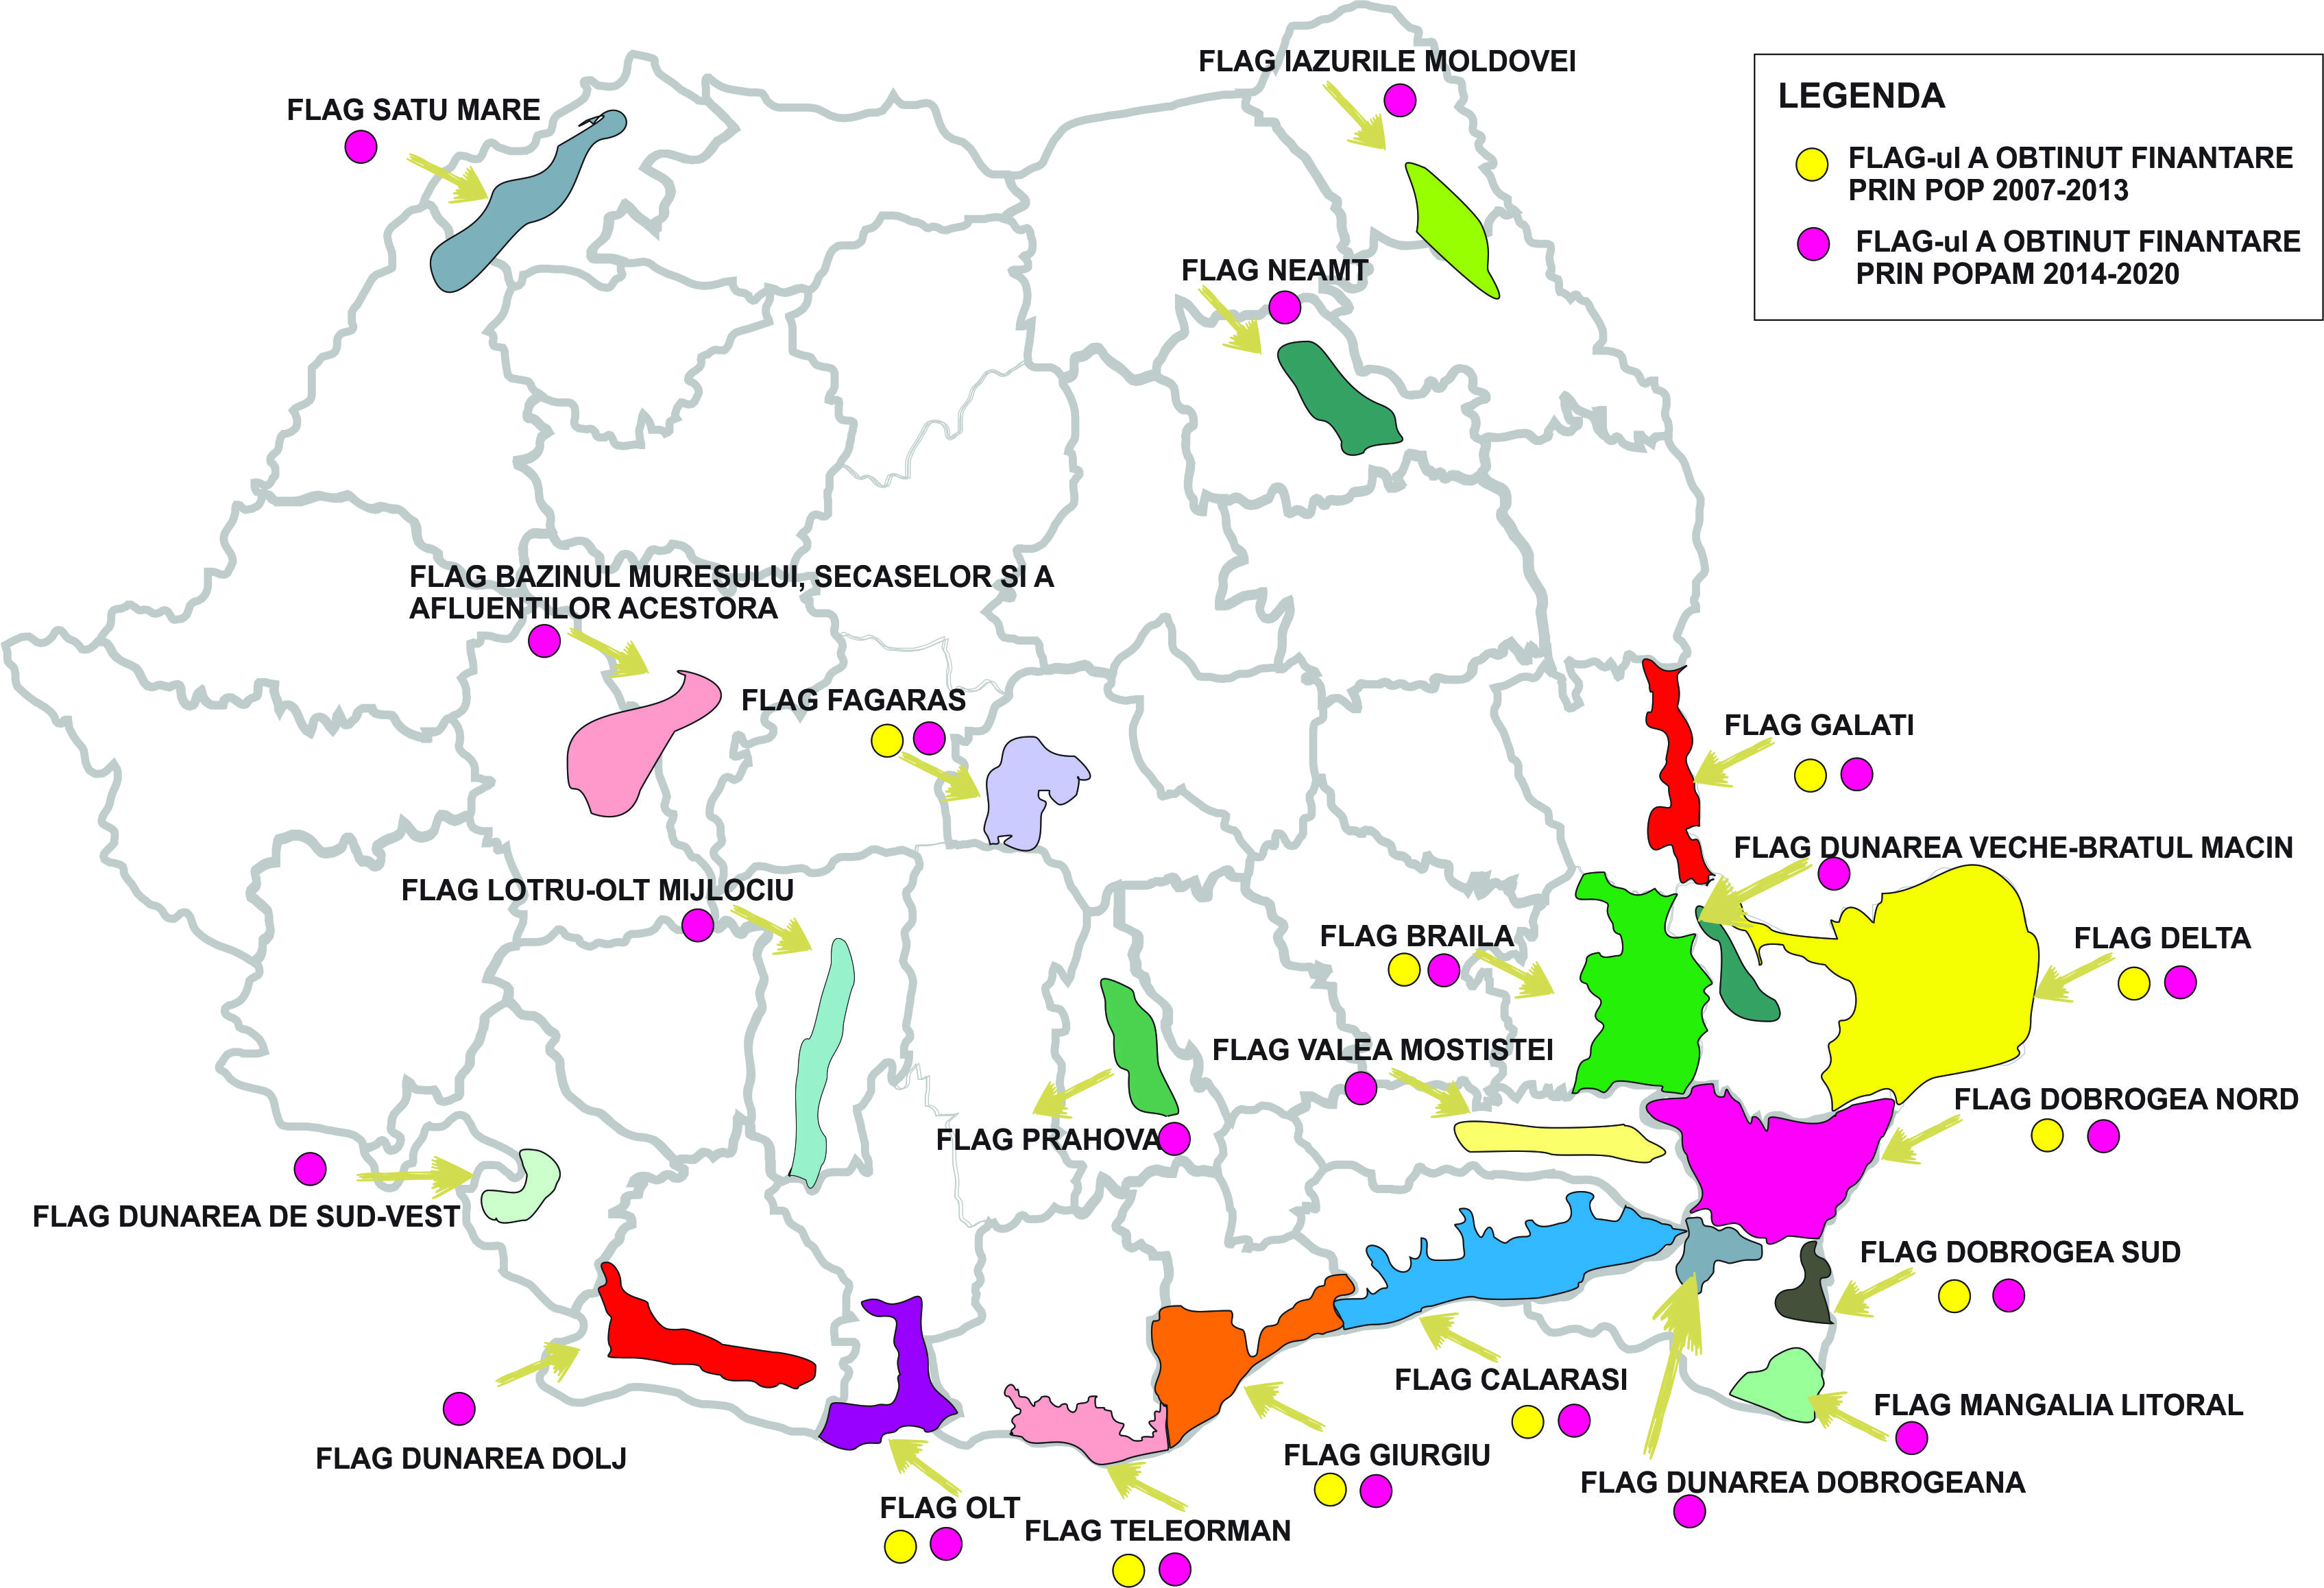 harta 2014-2020 refacut